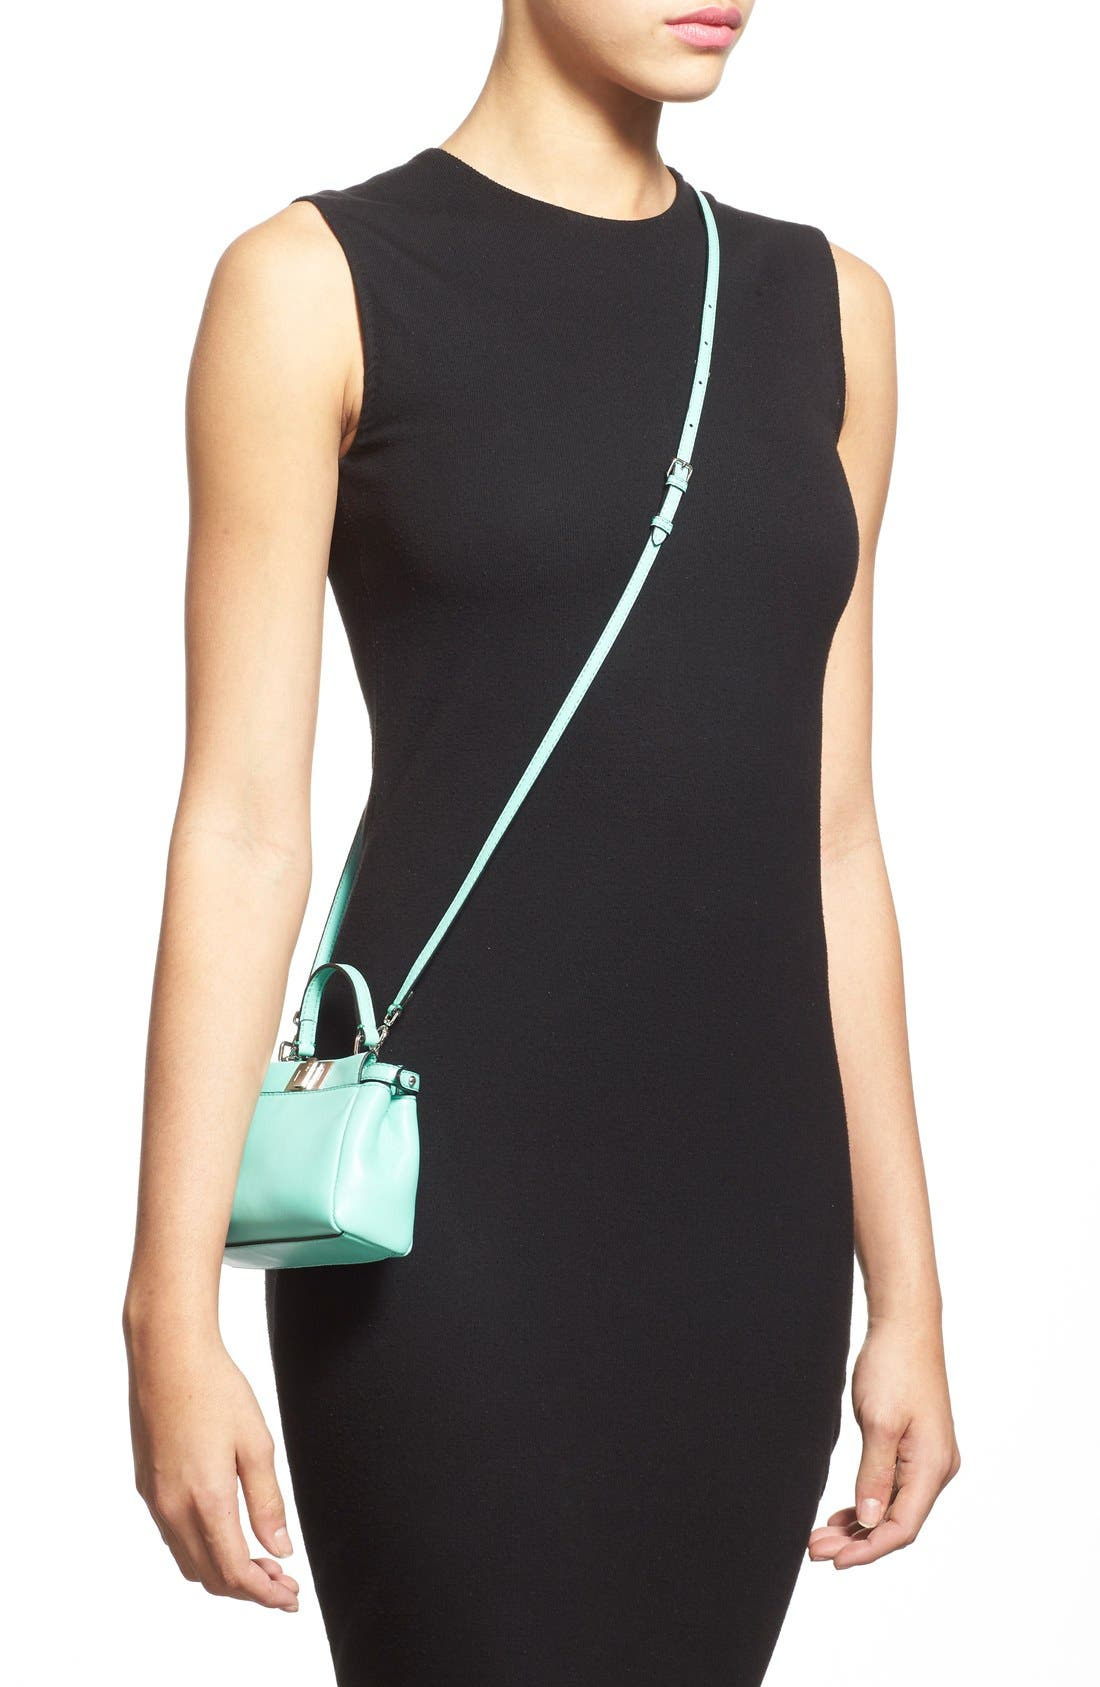 Alternate Image 2  - Fendi 'Micro Peekaboo' Nappa Leather Bag